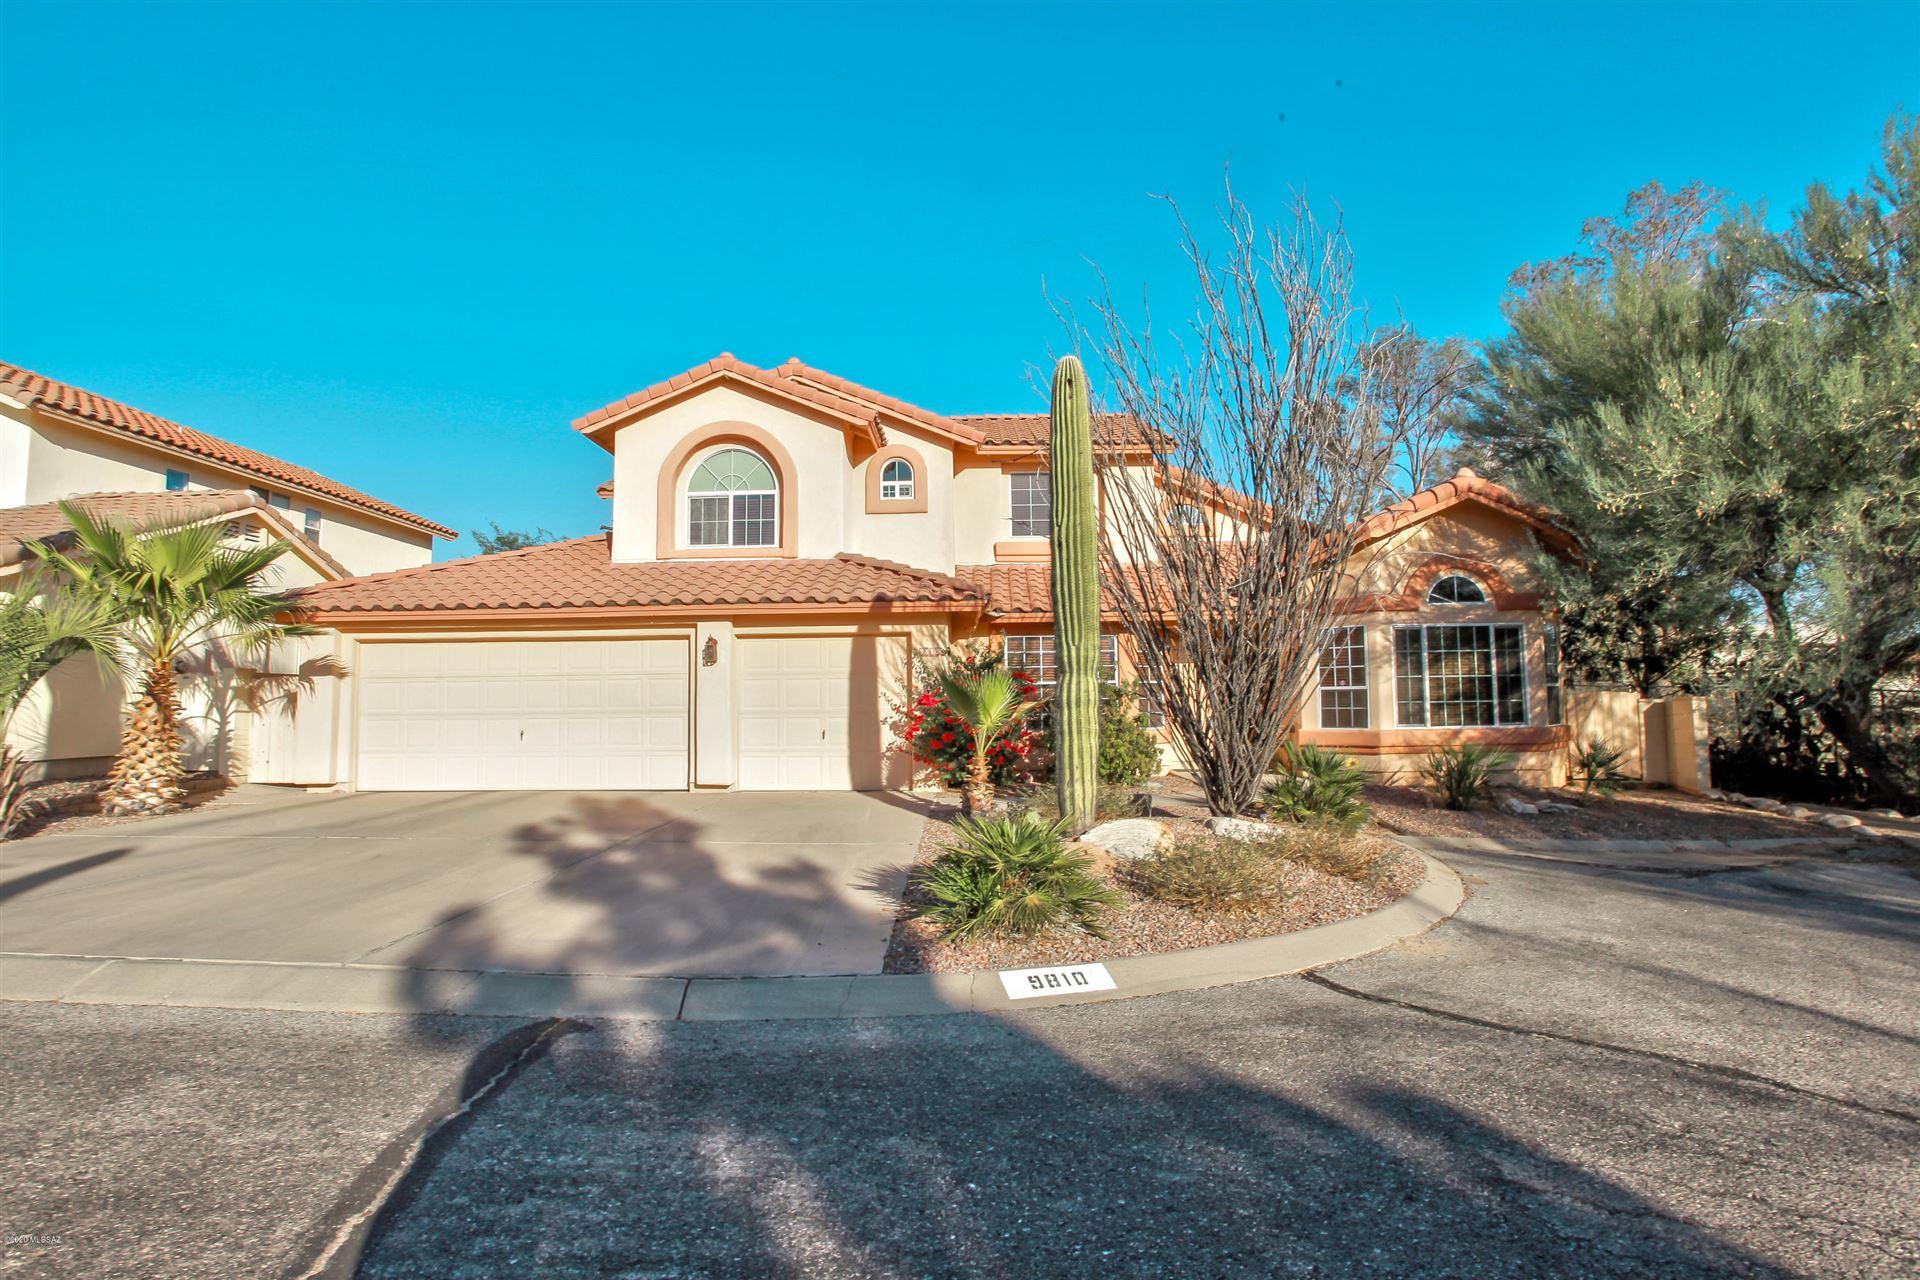 9810 N Windwalker Trail, Tucson, AZ 85742 - #: 22026302